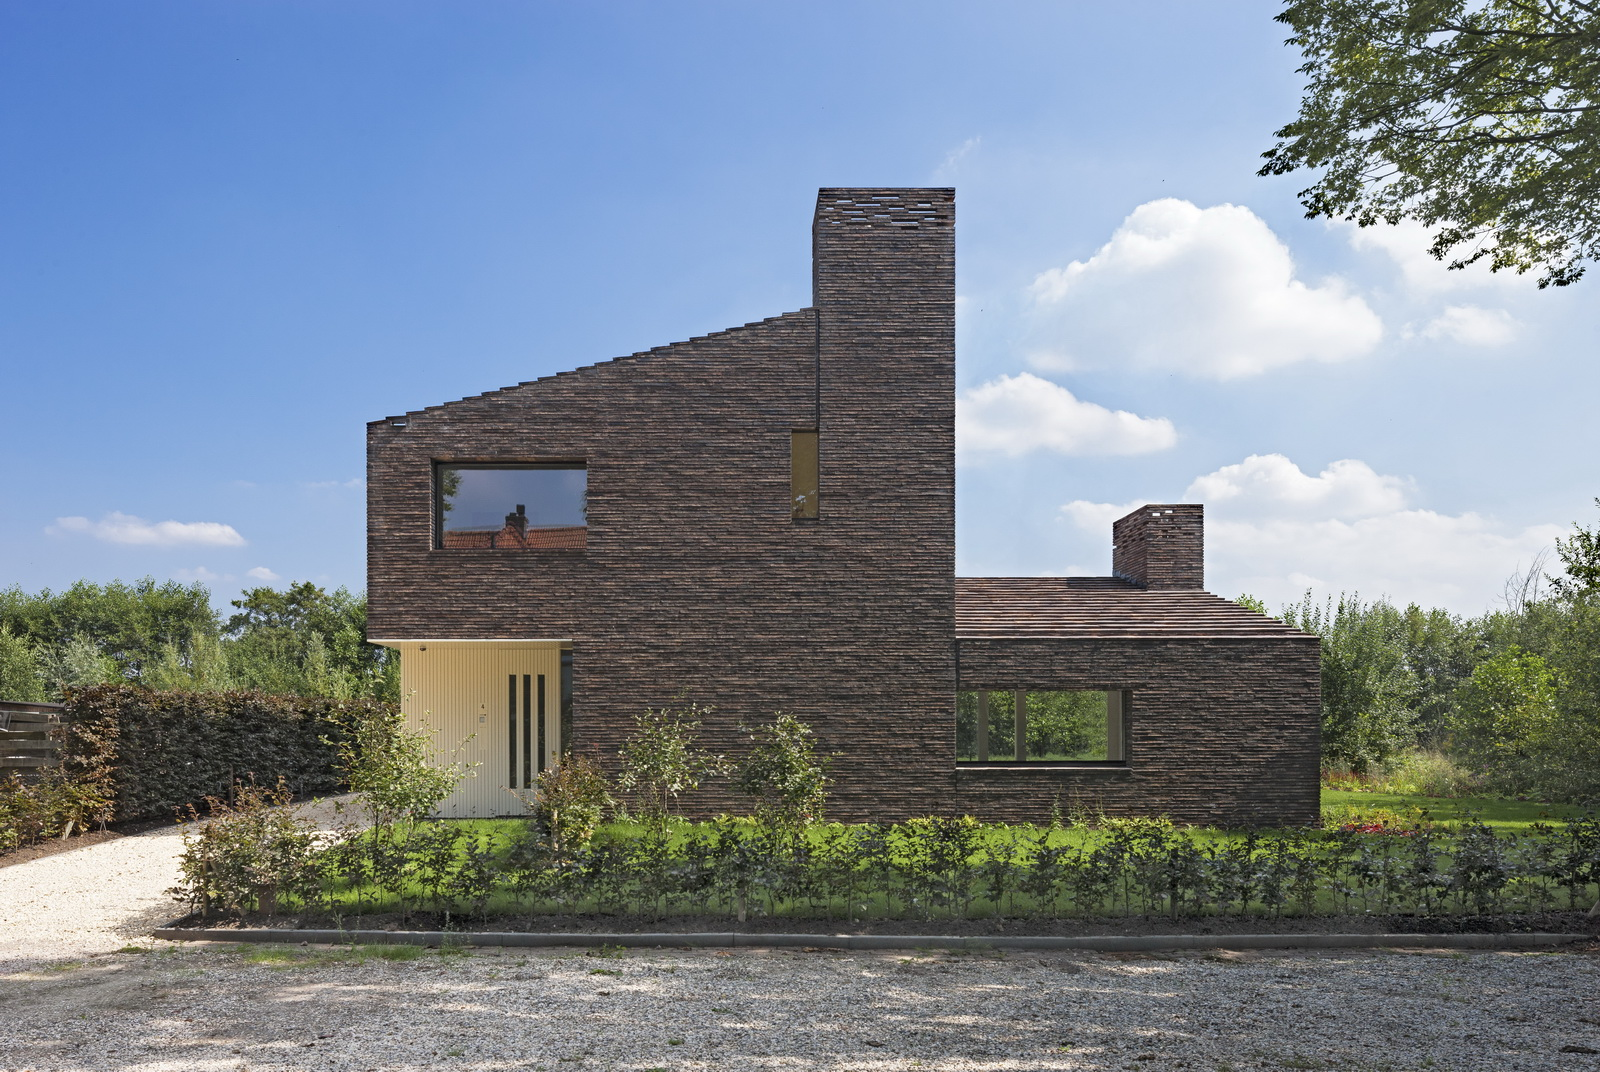 Brickhouse - Landscaping modern huis ...